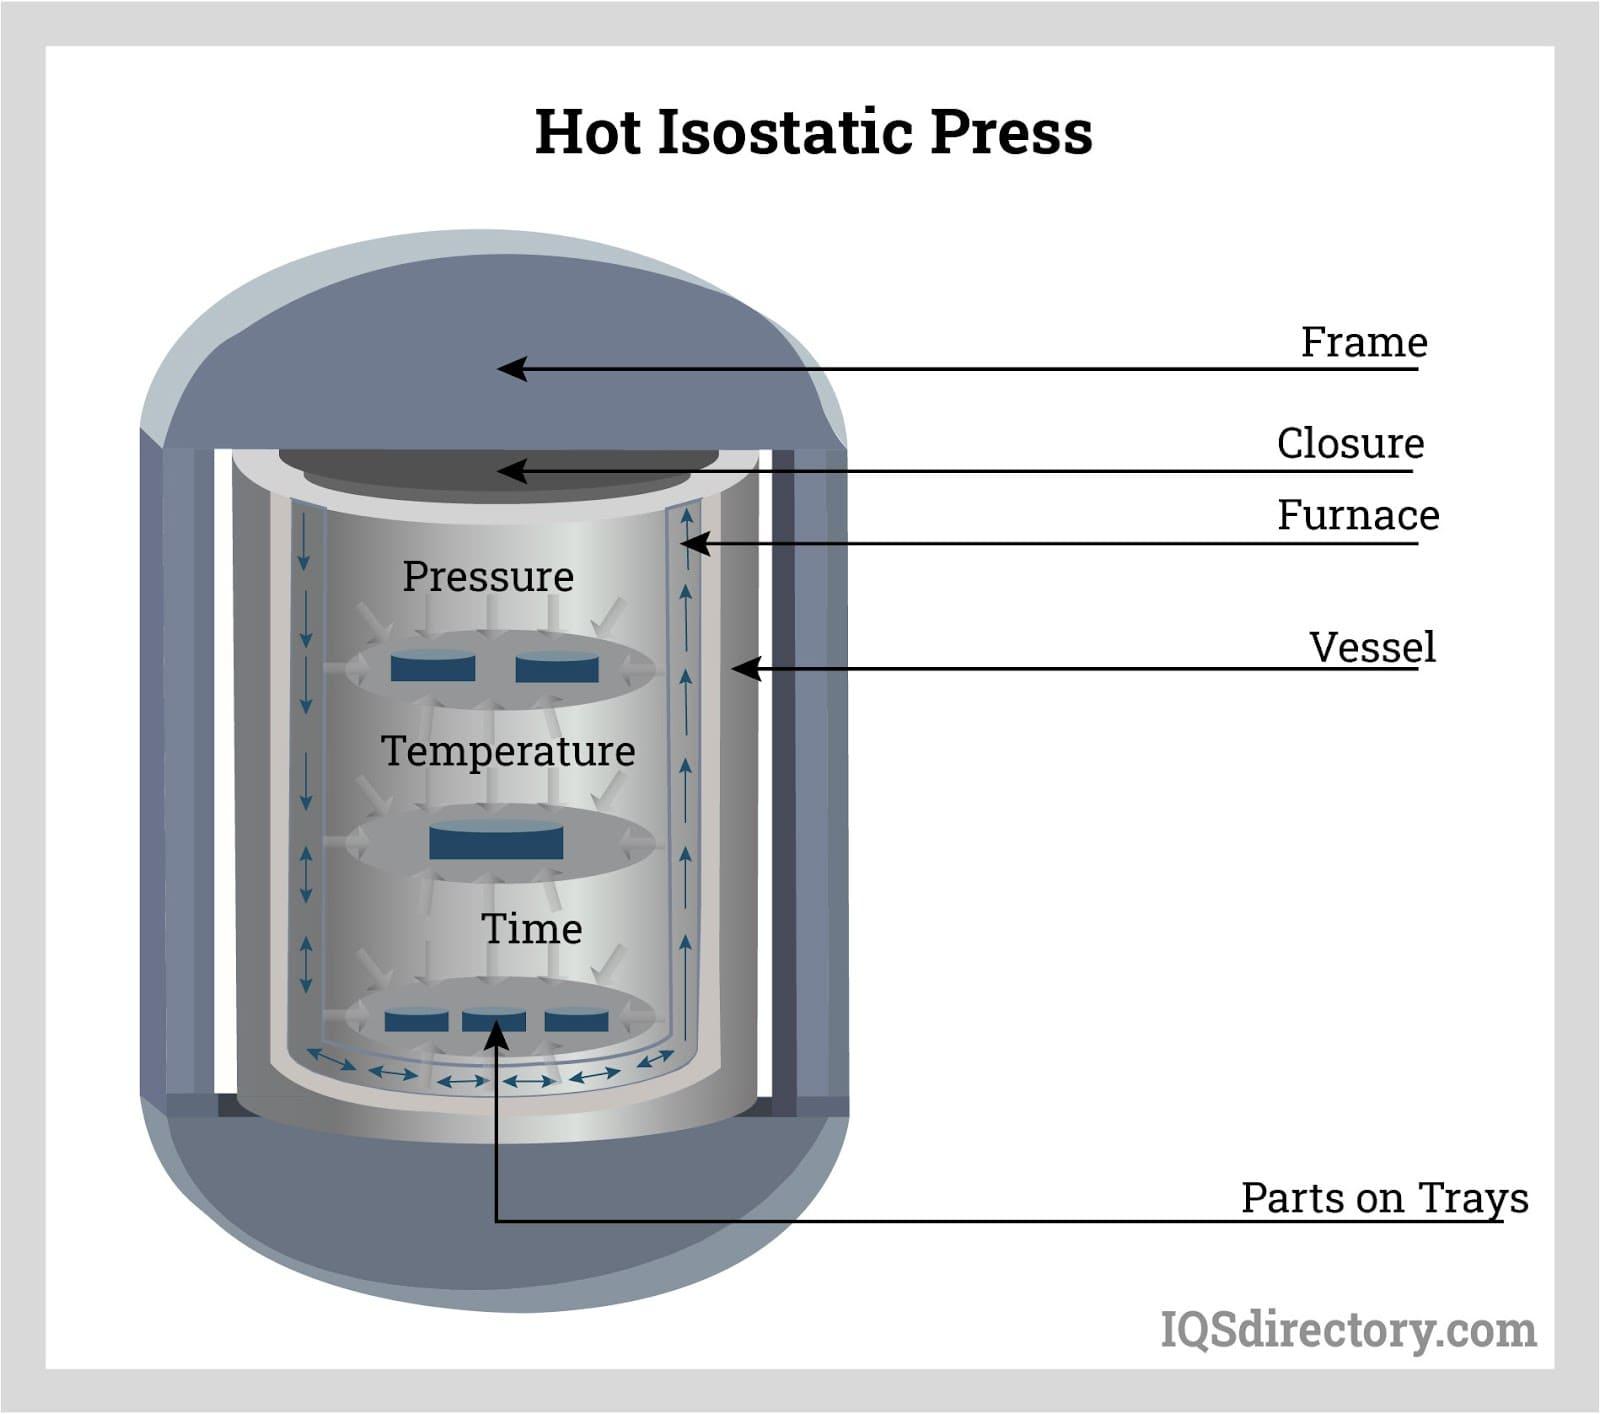 Hot Isostatic Press